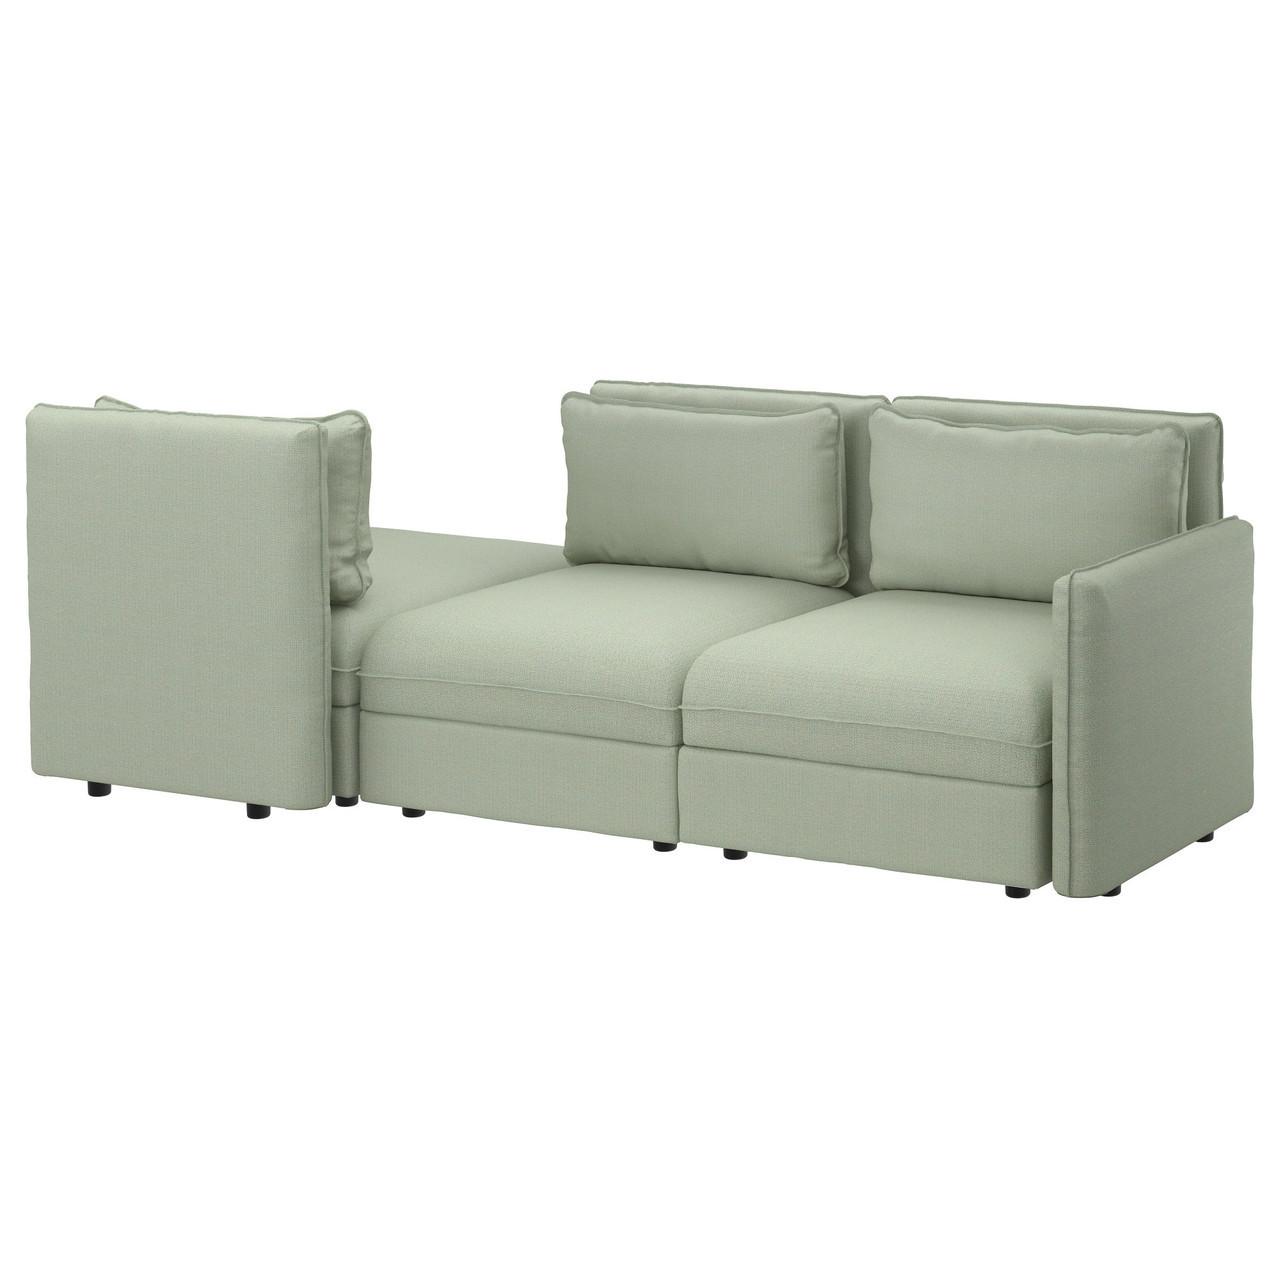 IKEA VALLENTUNA (891.625.84)  3-местный диван, Orrsta светло-серый